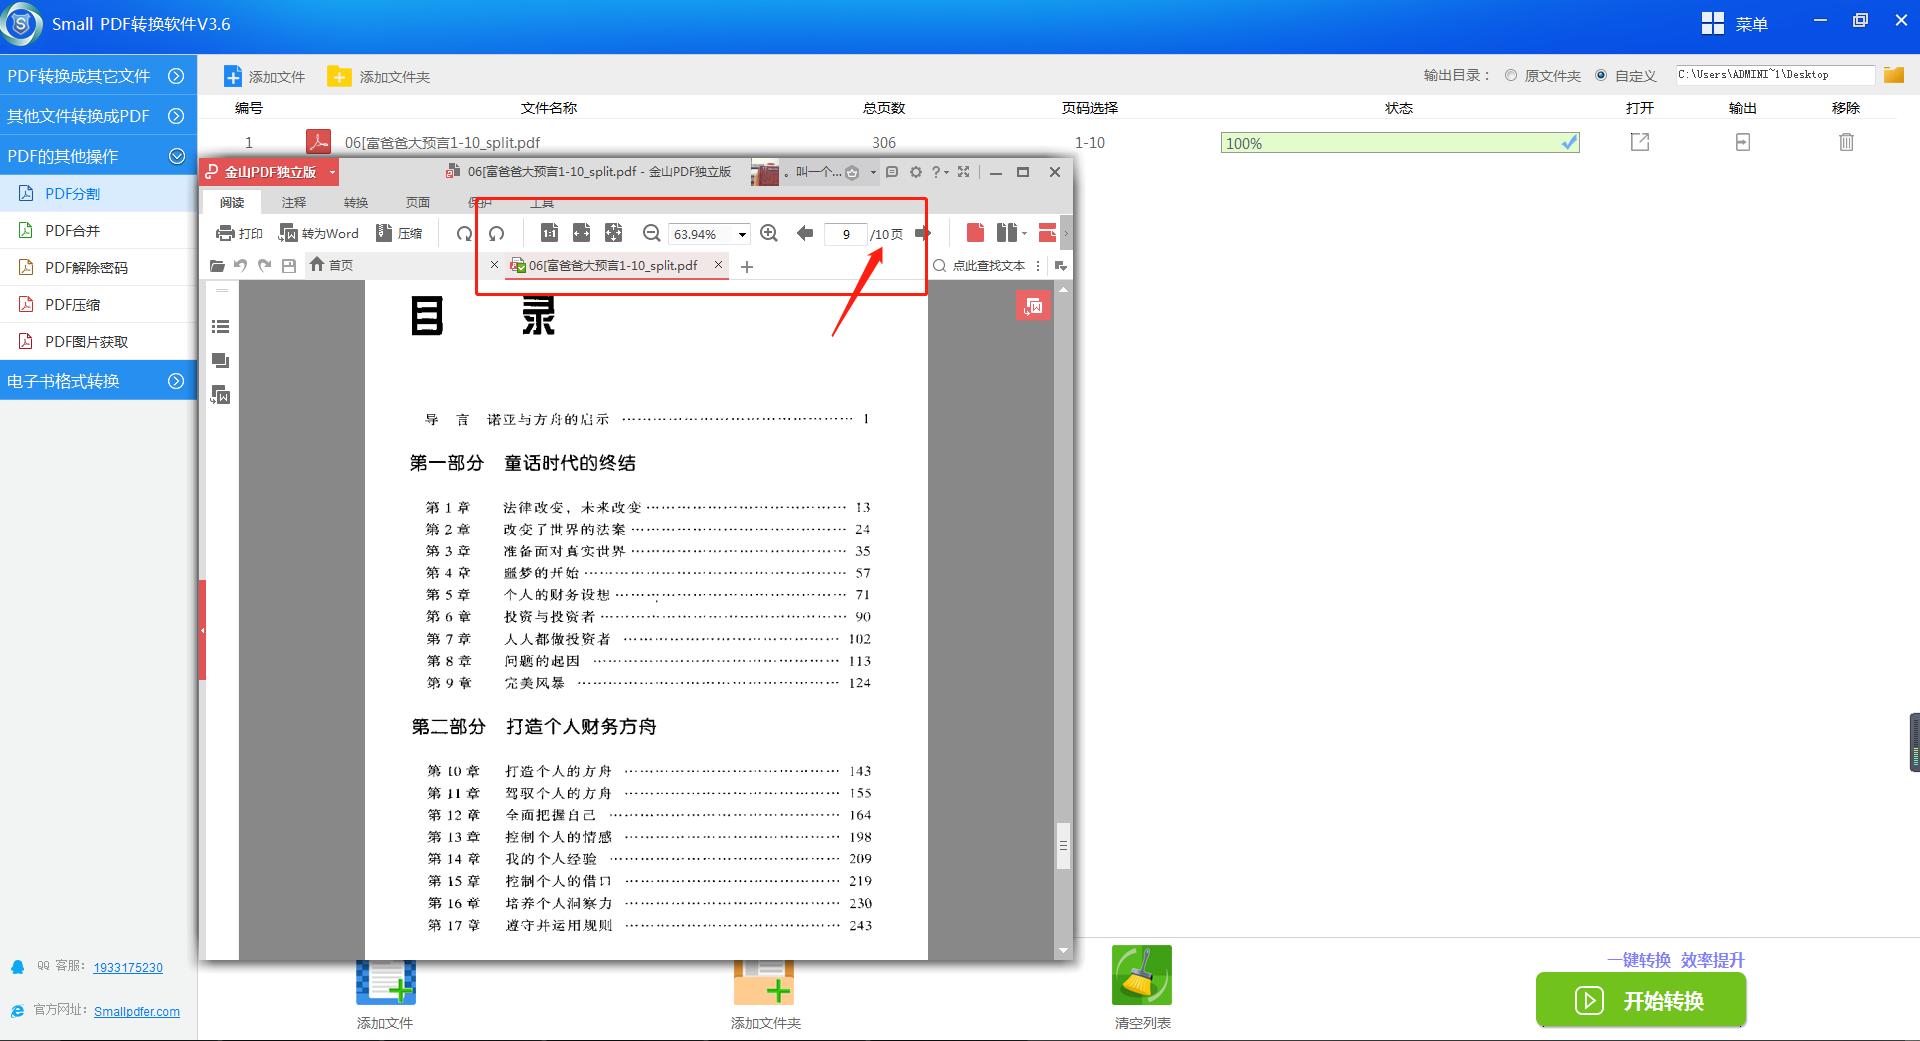 Small word转PDF软件pdf分割操作-6